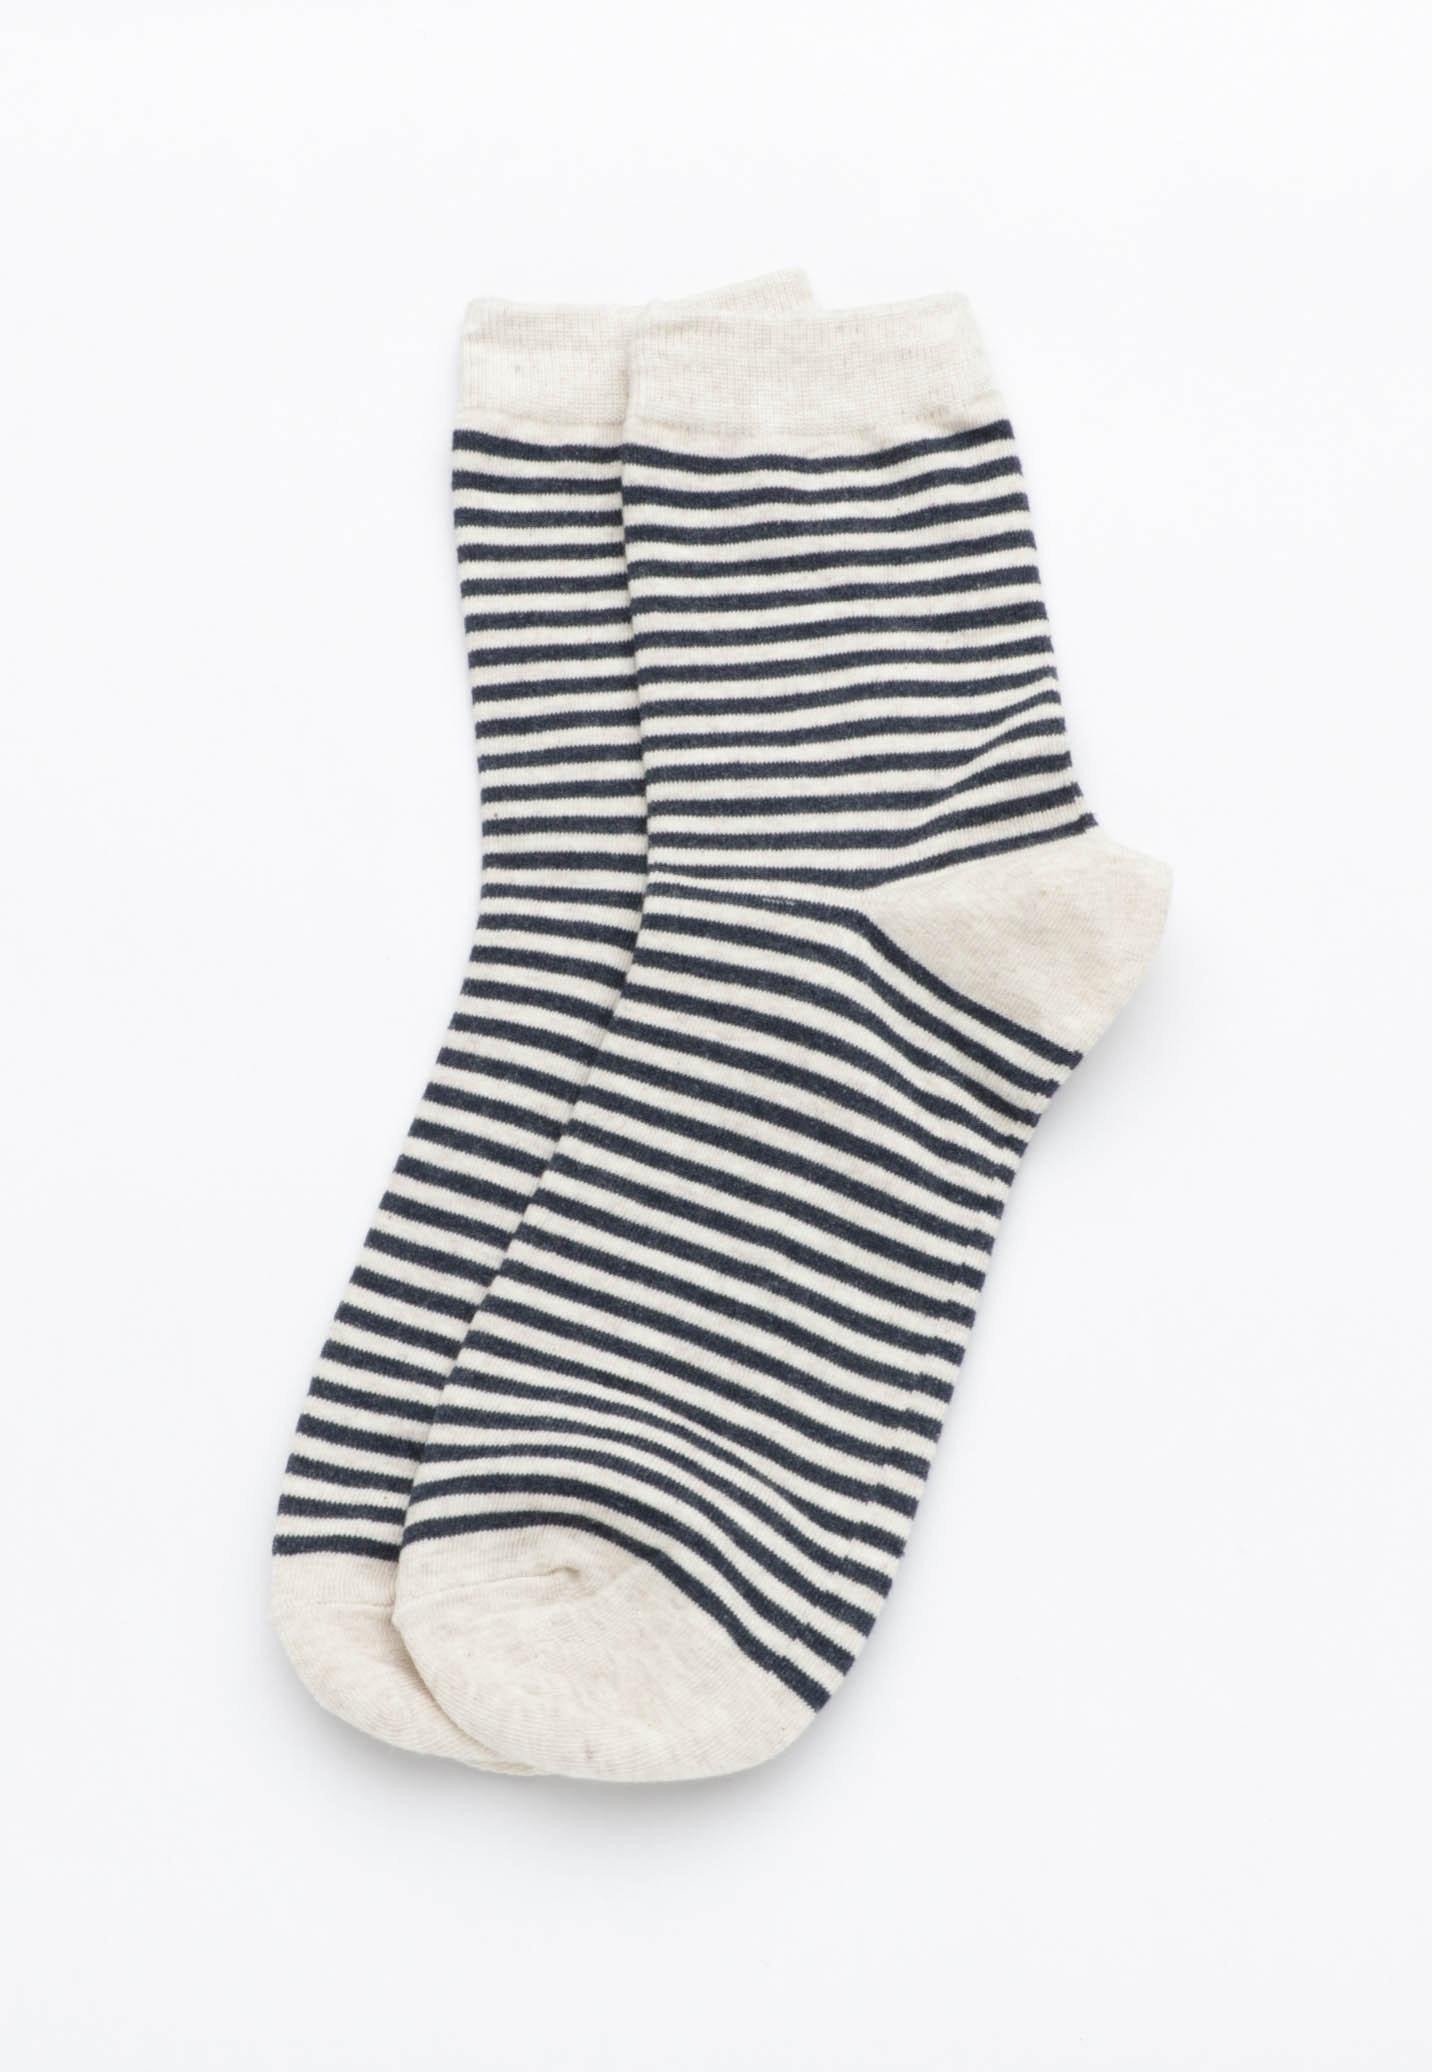 Stripey Socks - Oatmeal/ Navy